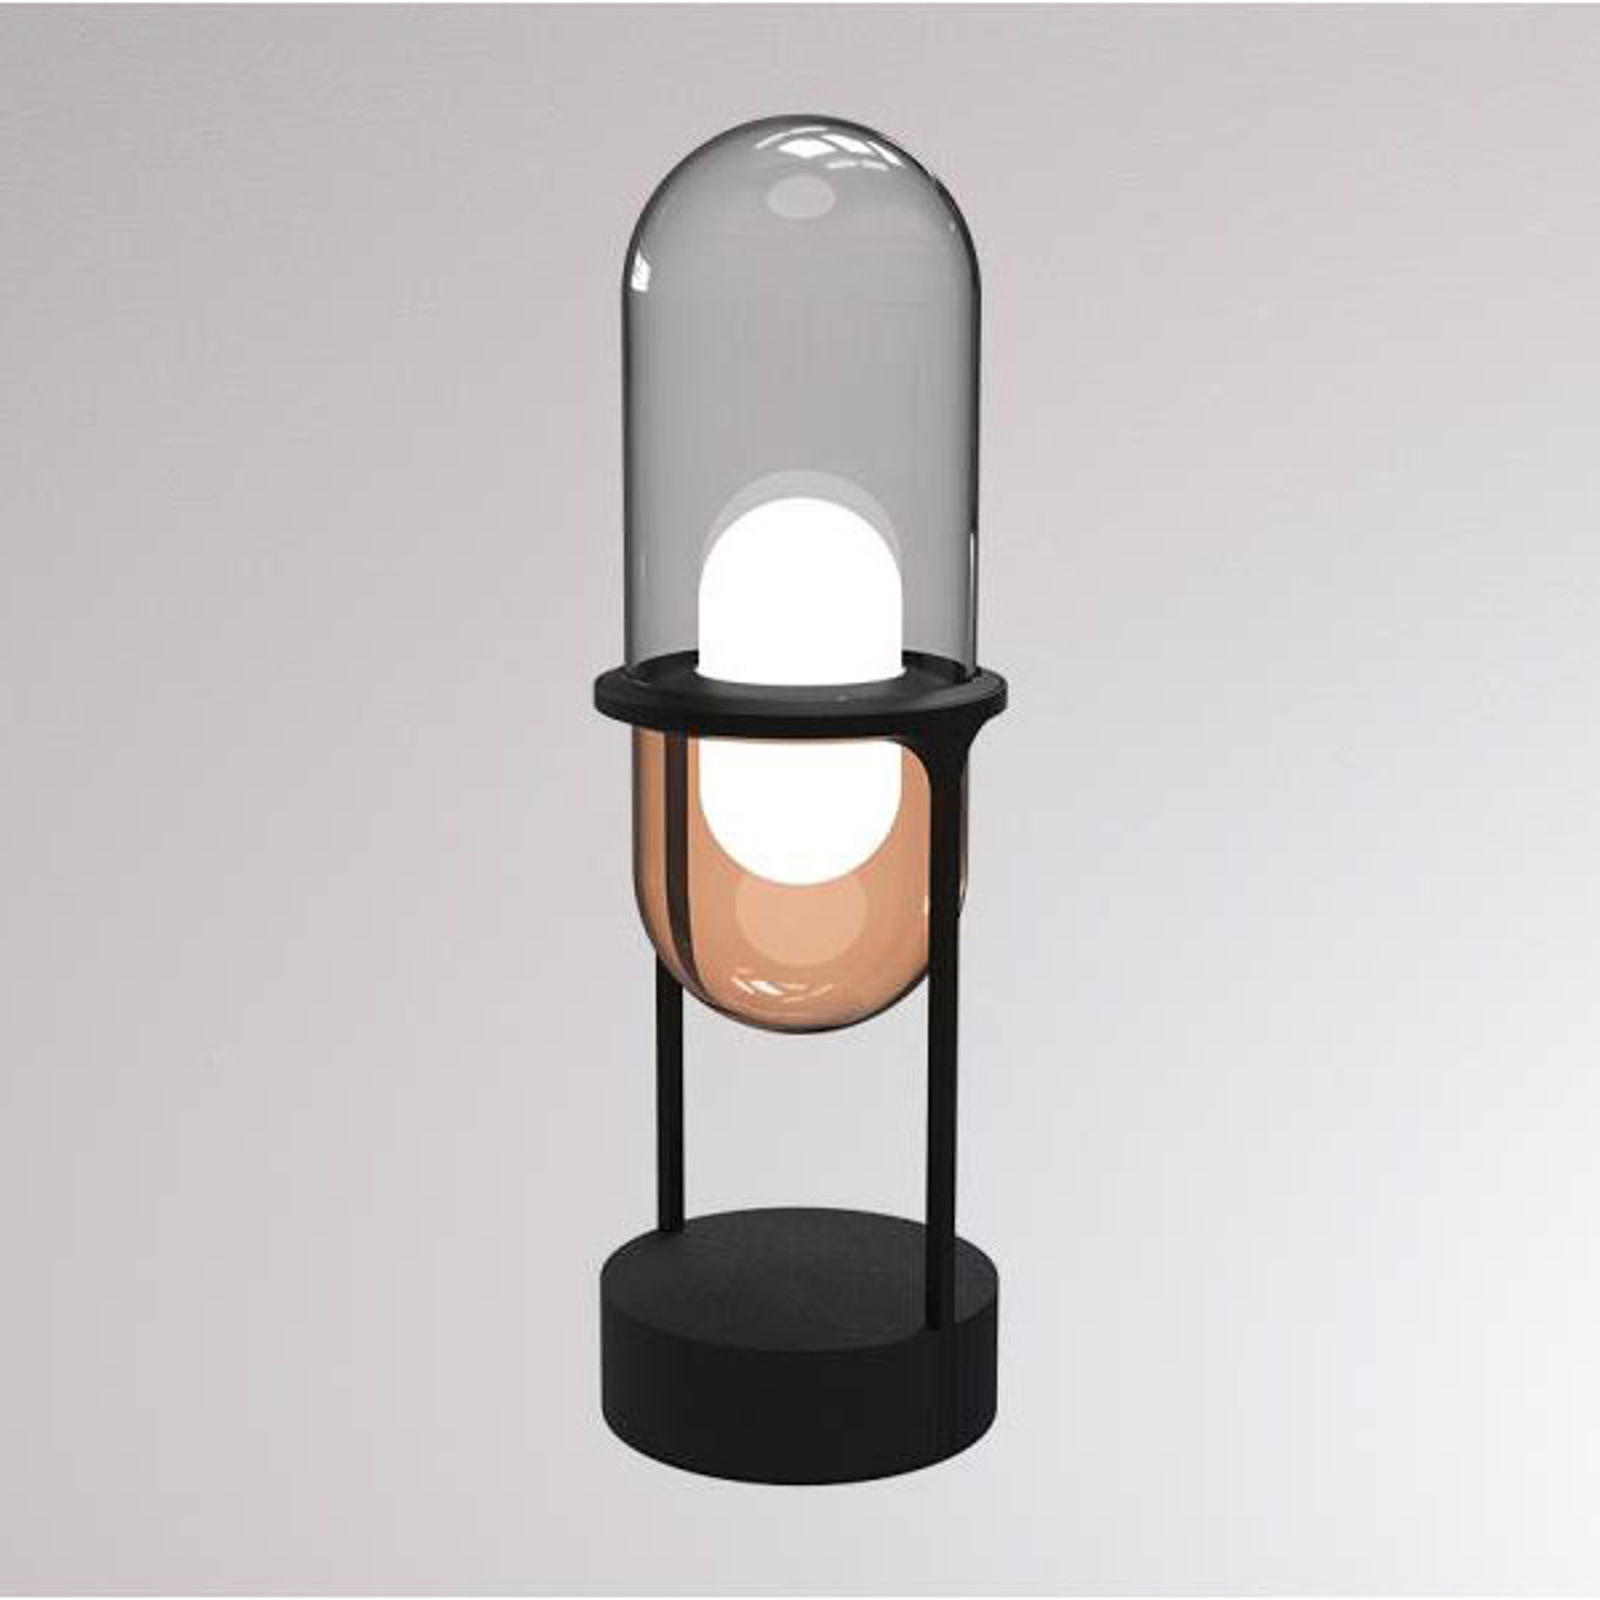 LOUM Pille LED tafellamp grijs/koper